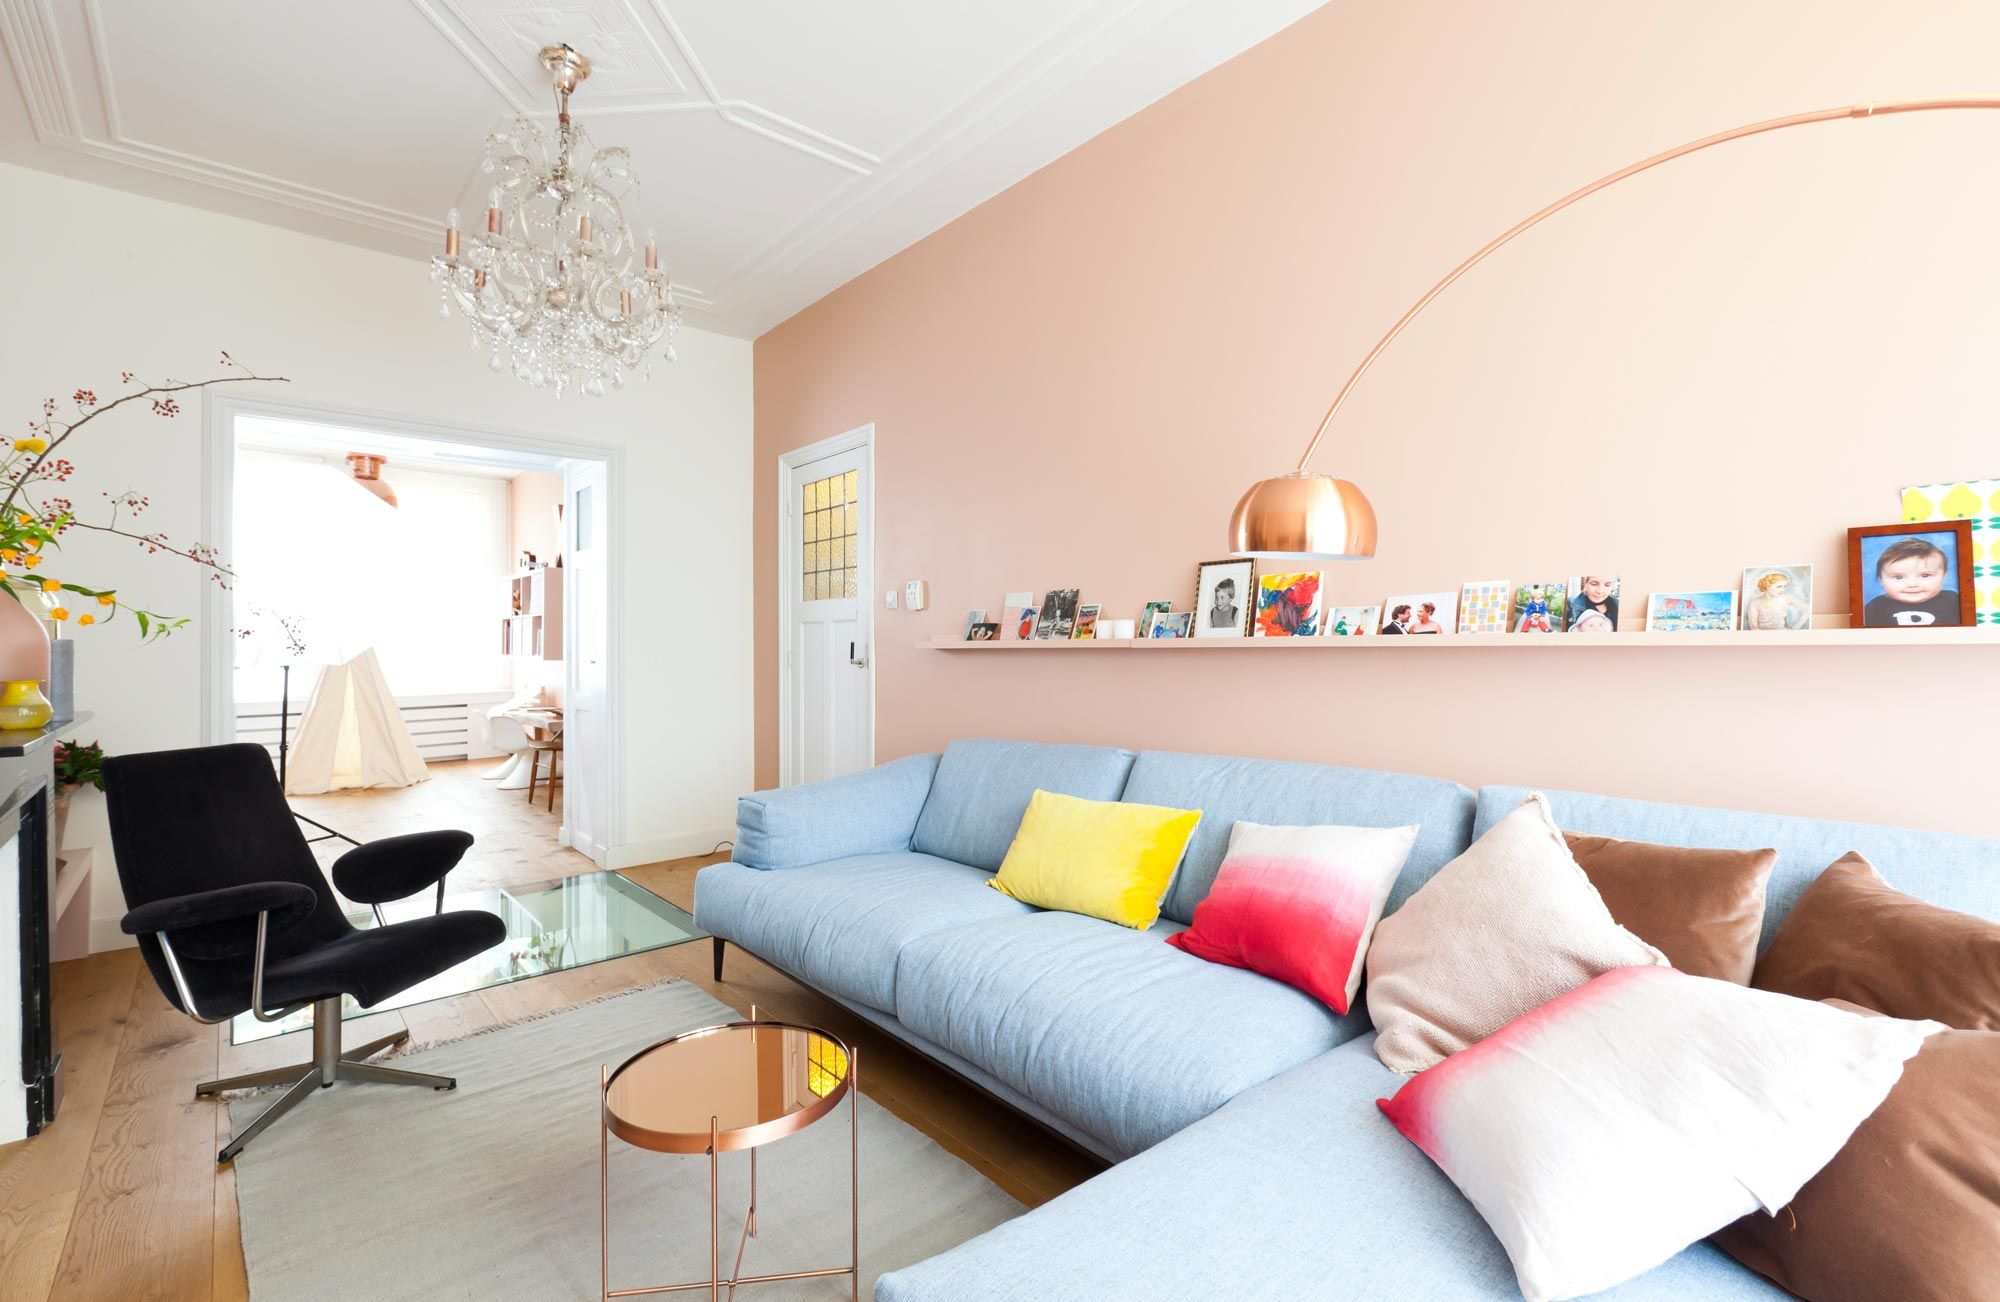 Pastel interieur vt wonen op de muur achter de bank kleur vla